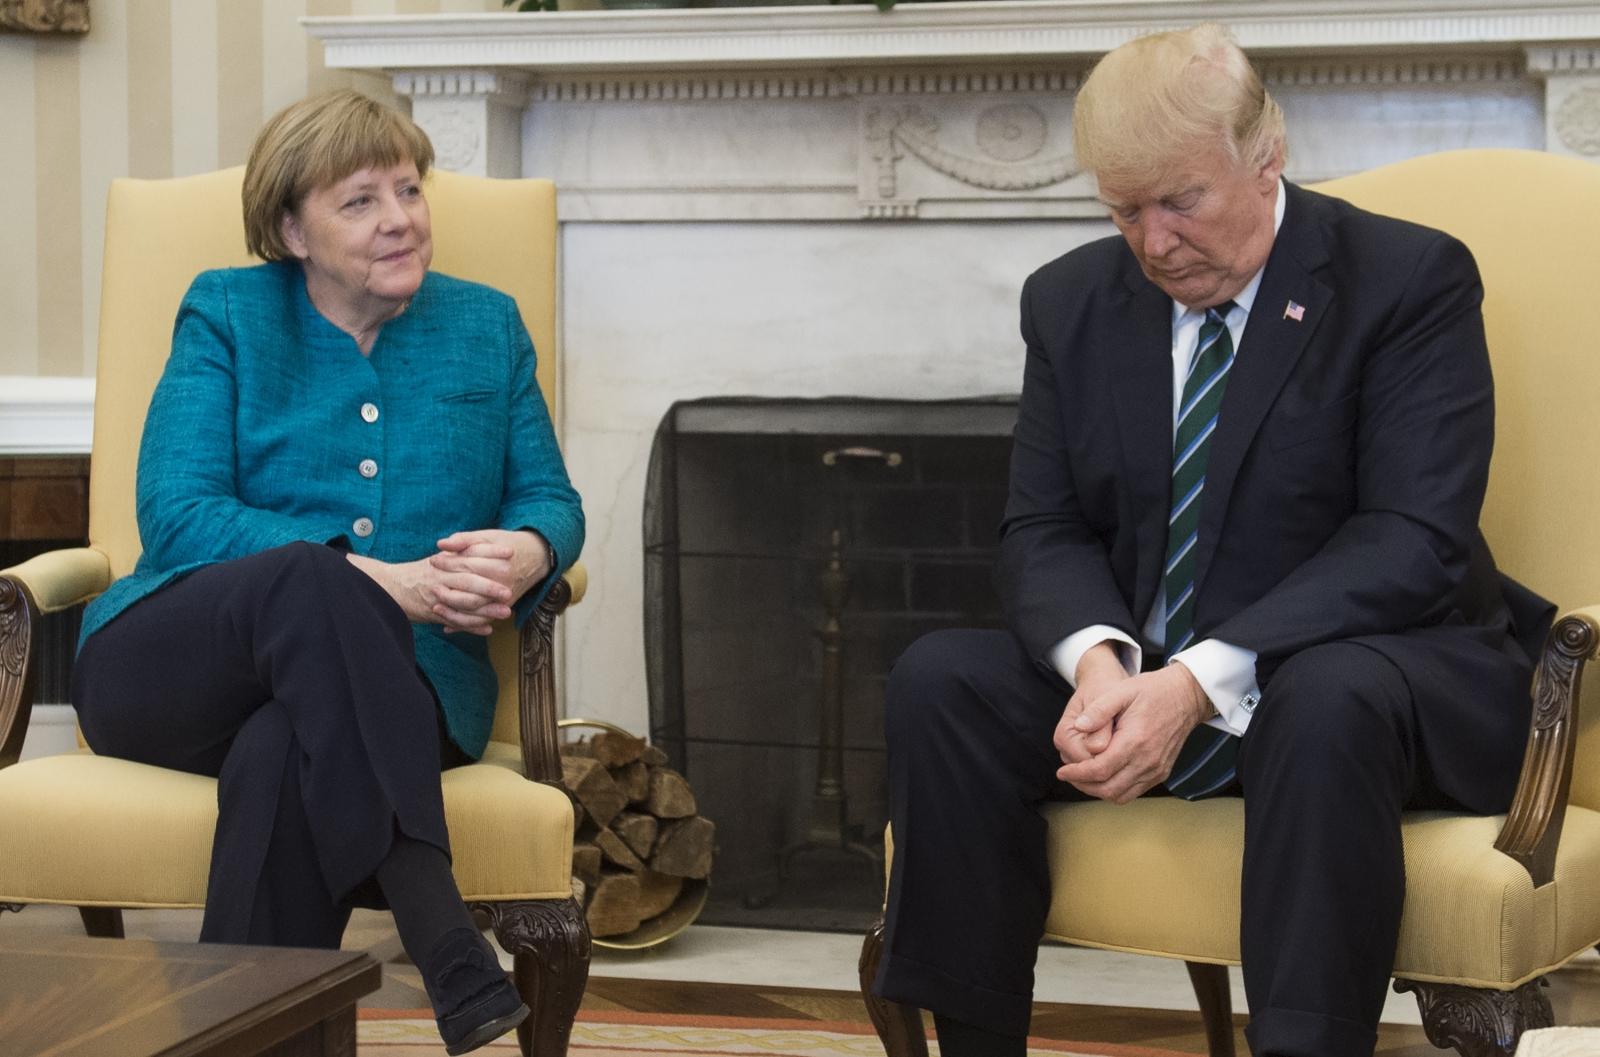 news politics articles donald trump angela merkels awkward white house summit